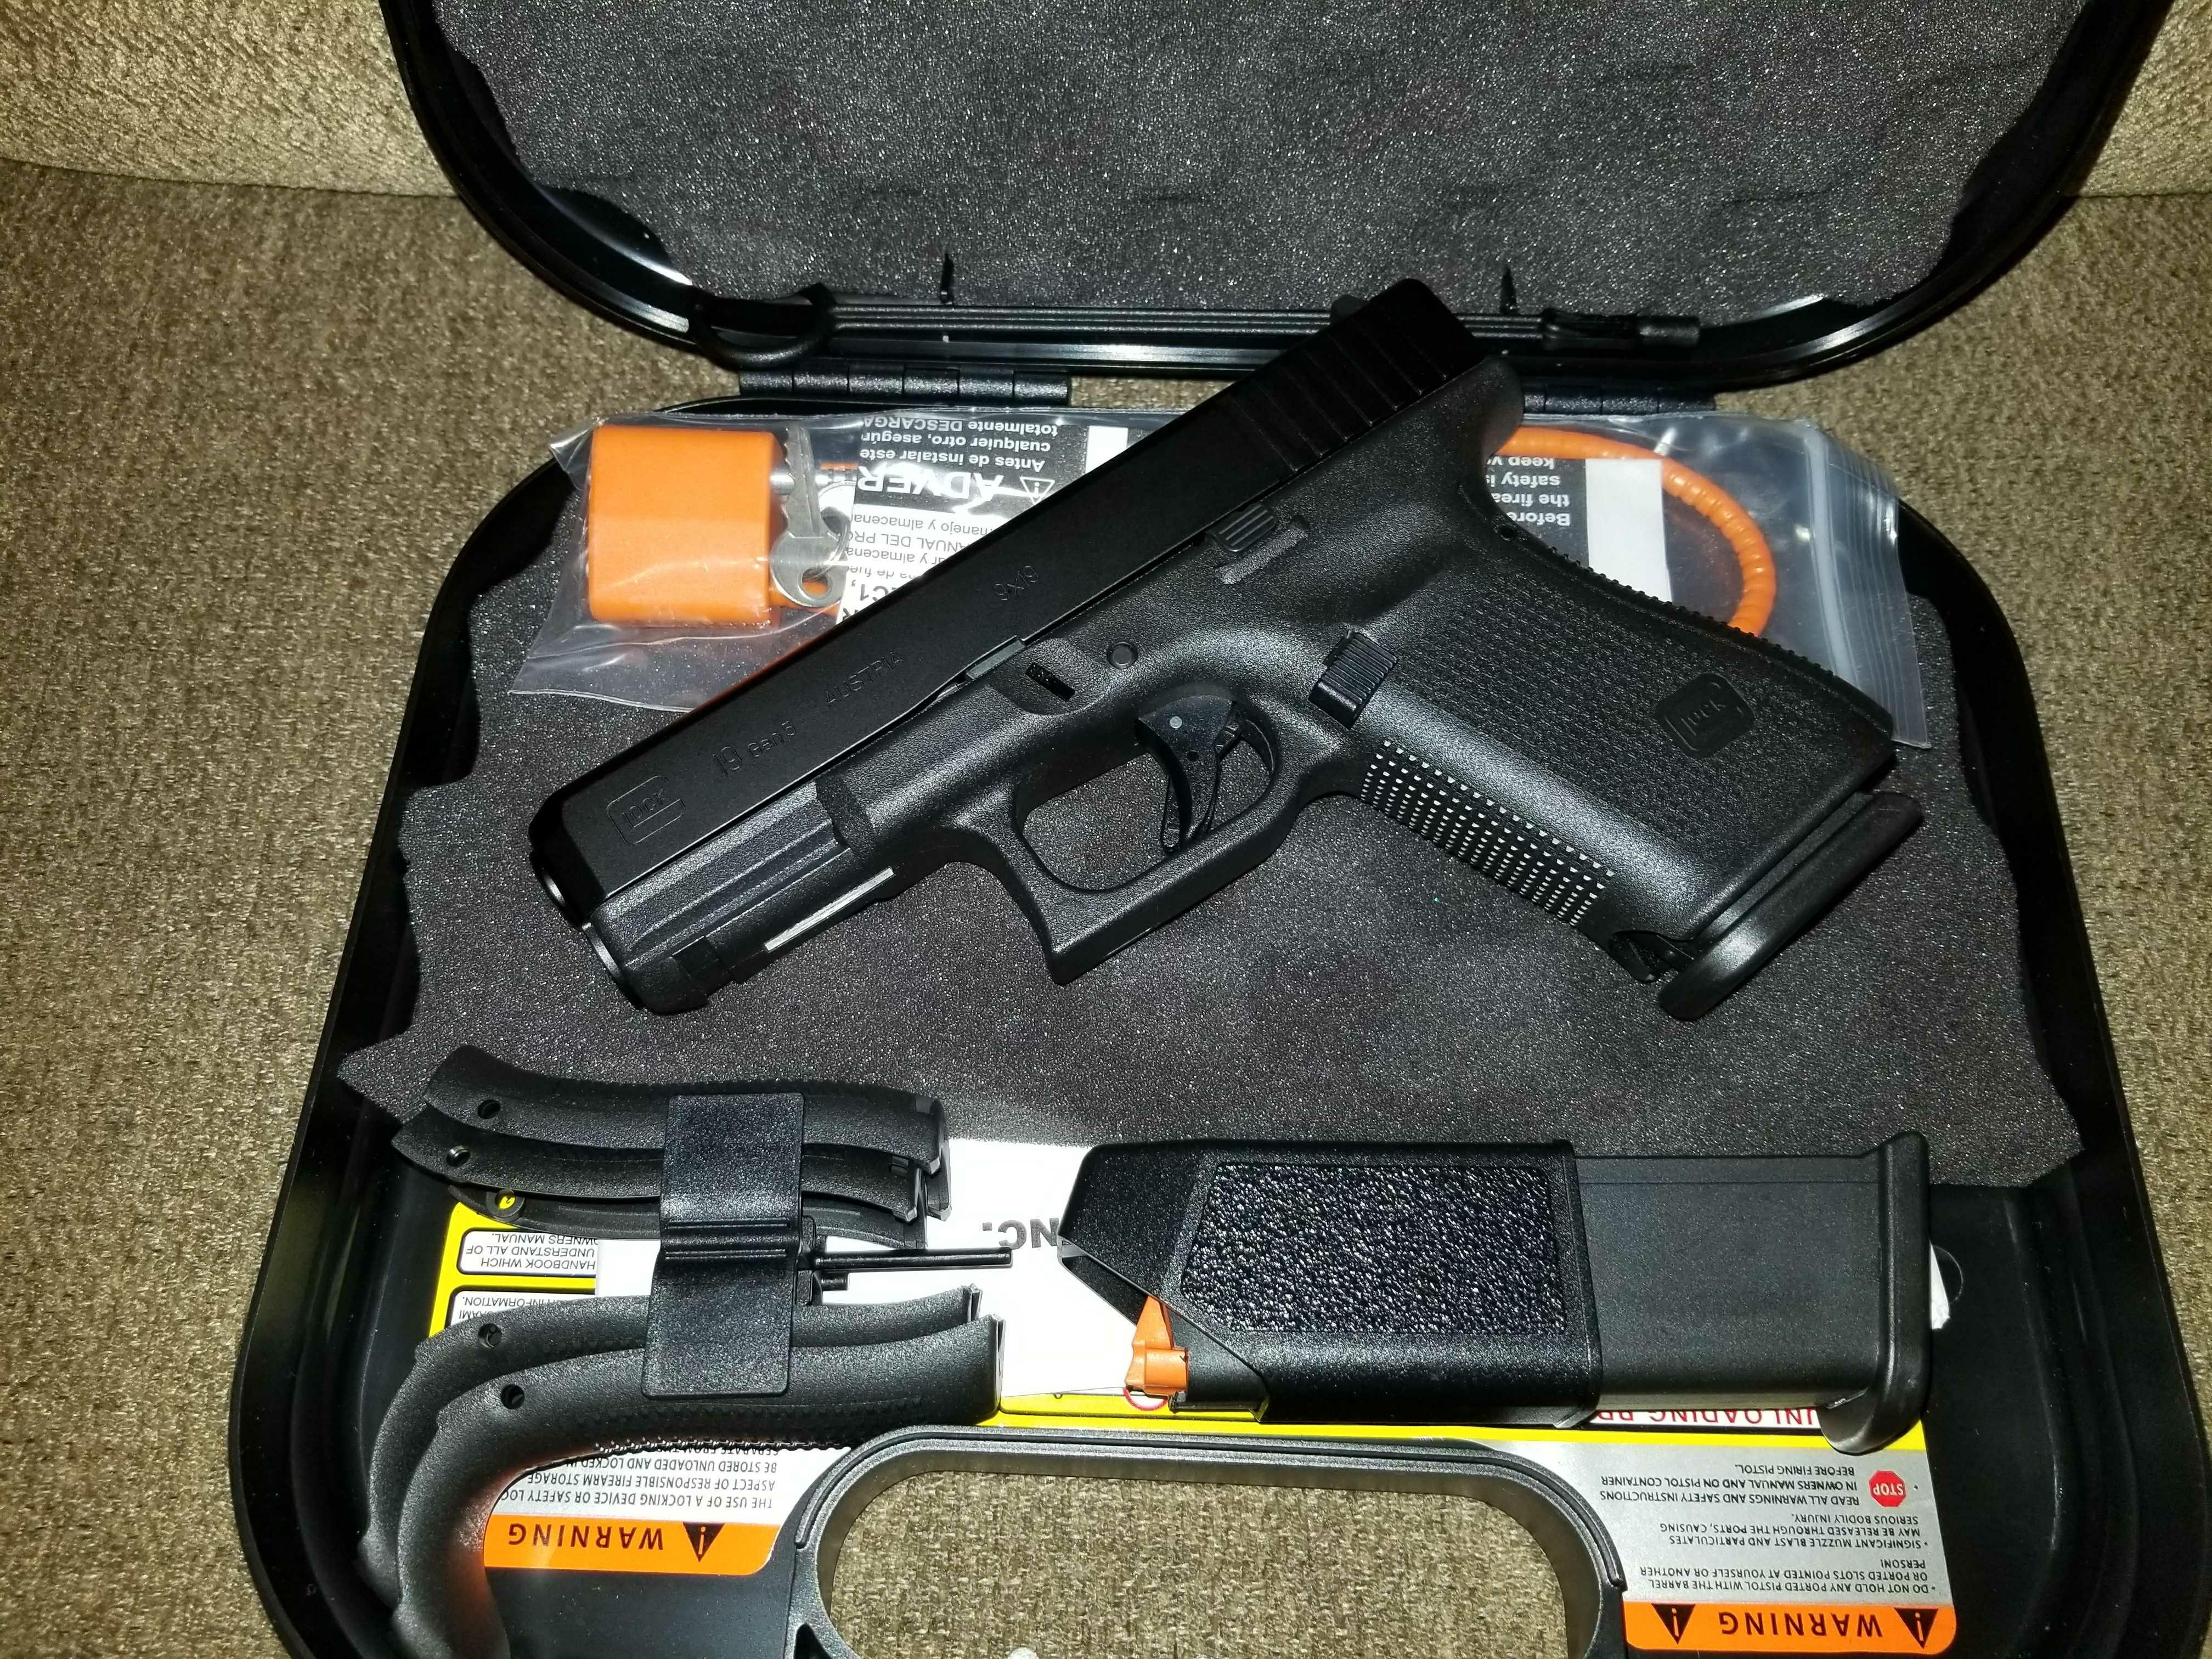 Oklahoma City - BNIB Glock 19 Gen 5 W/Night Sights ...